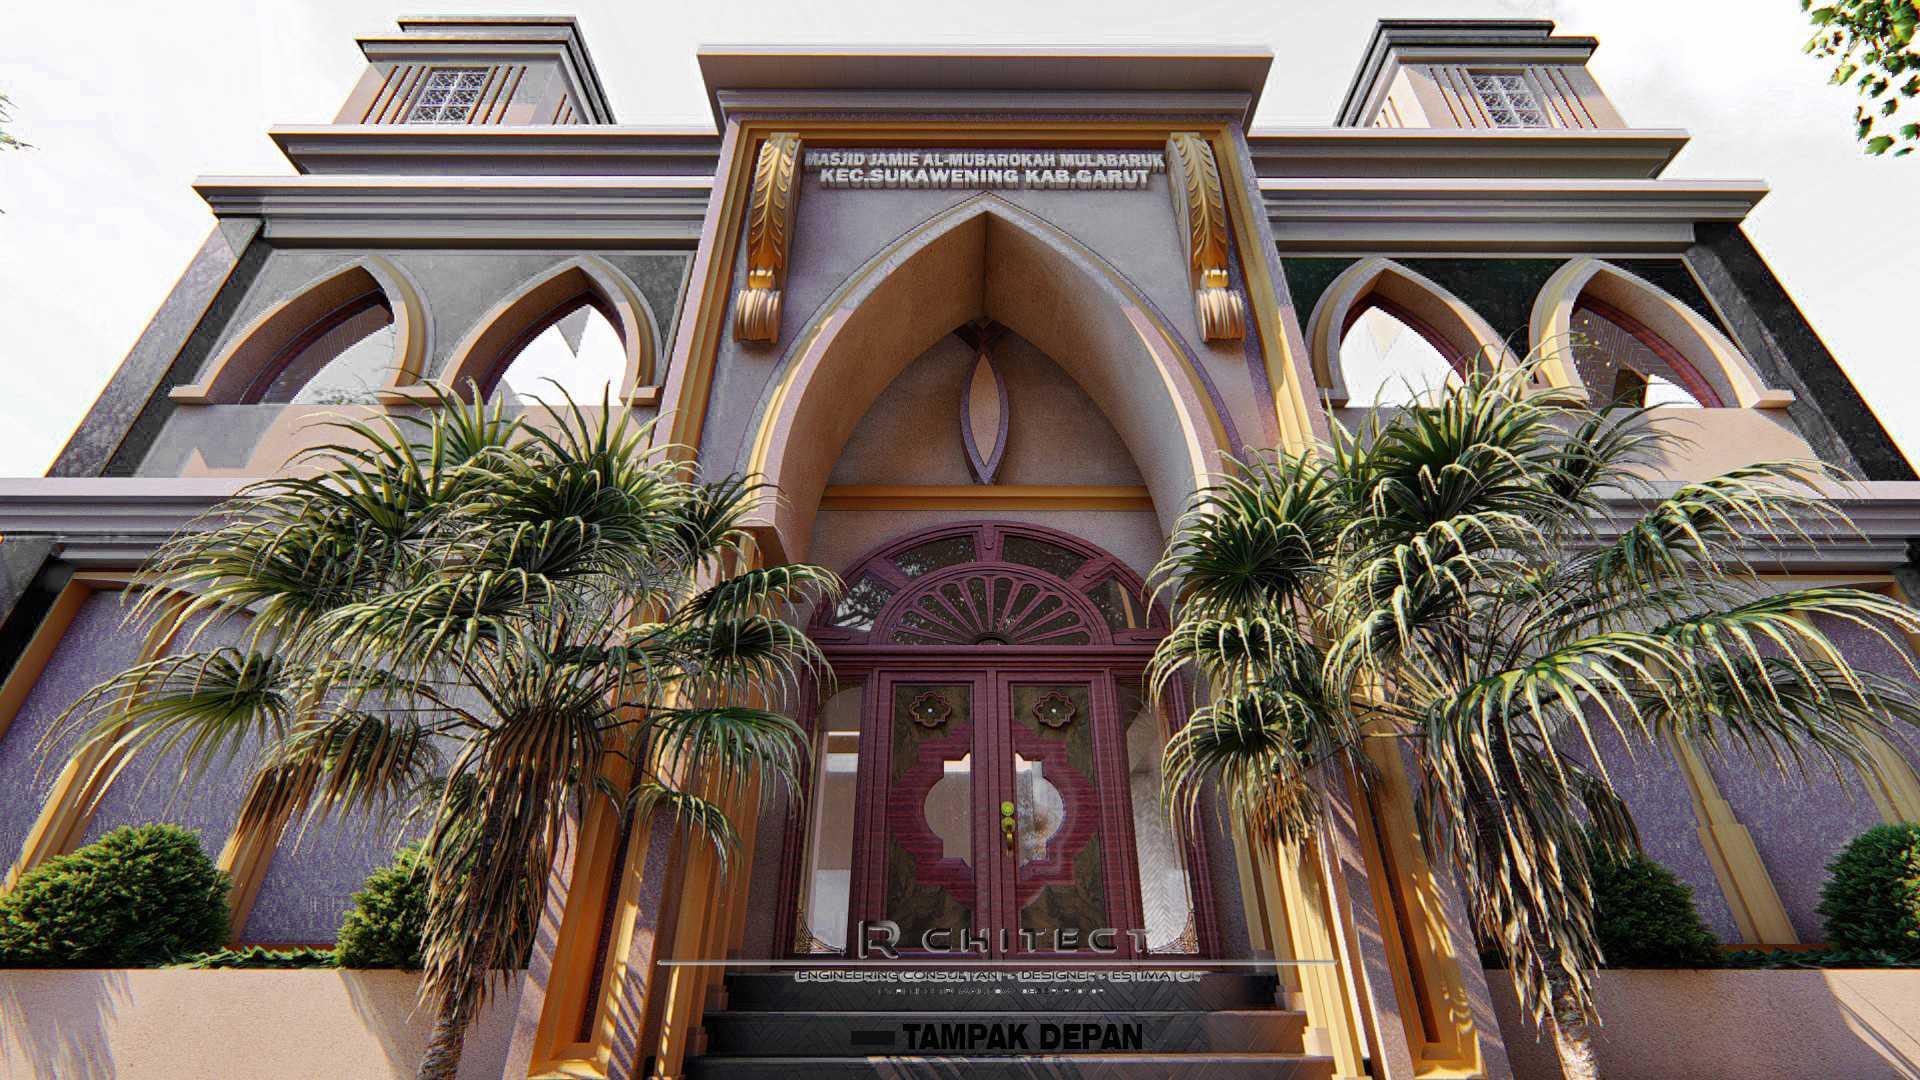 Rchitect Masjid Al-Mubarokah Sukawening, Kabupaten Garut, Jawa Barat, Indonesia Sukawening, Kabupaten Garut, Jawa Barat, Indonesia Rchitect-Masjid-Al-Mubarokah   75338